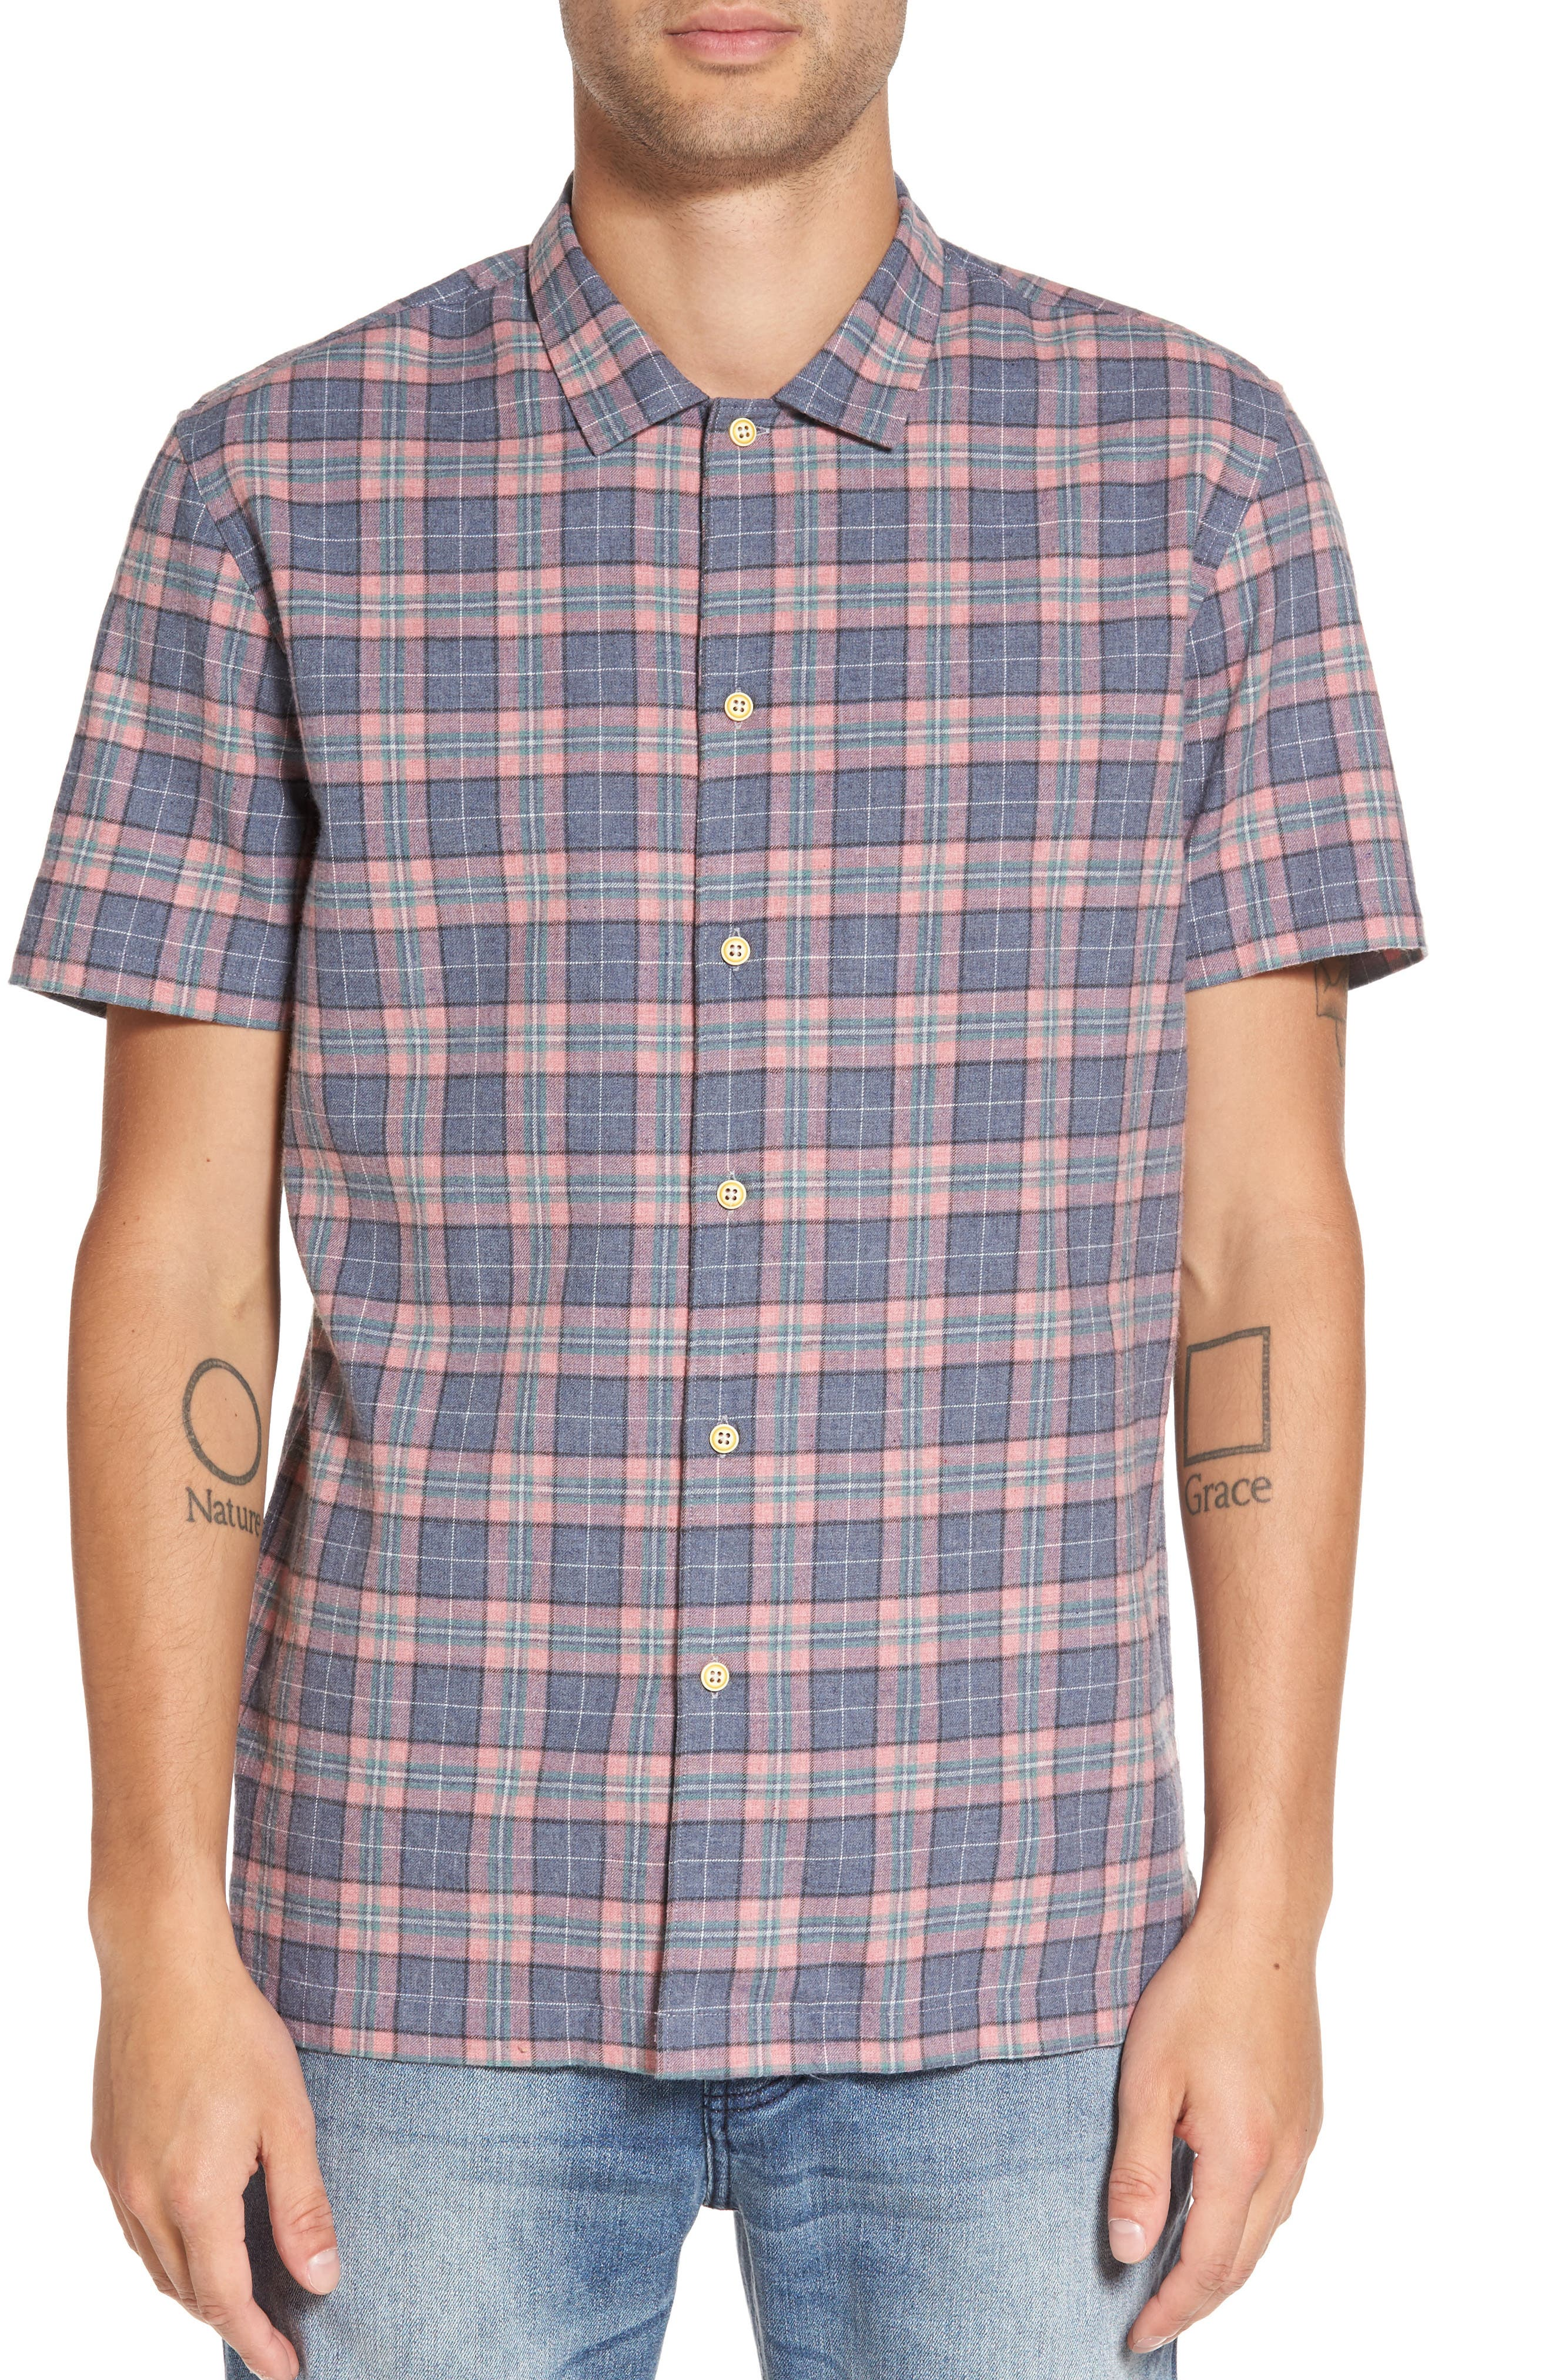 Barney Cools Florida Short Sleeve Plaid Shirt